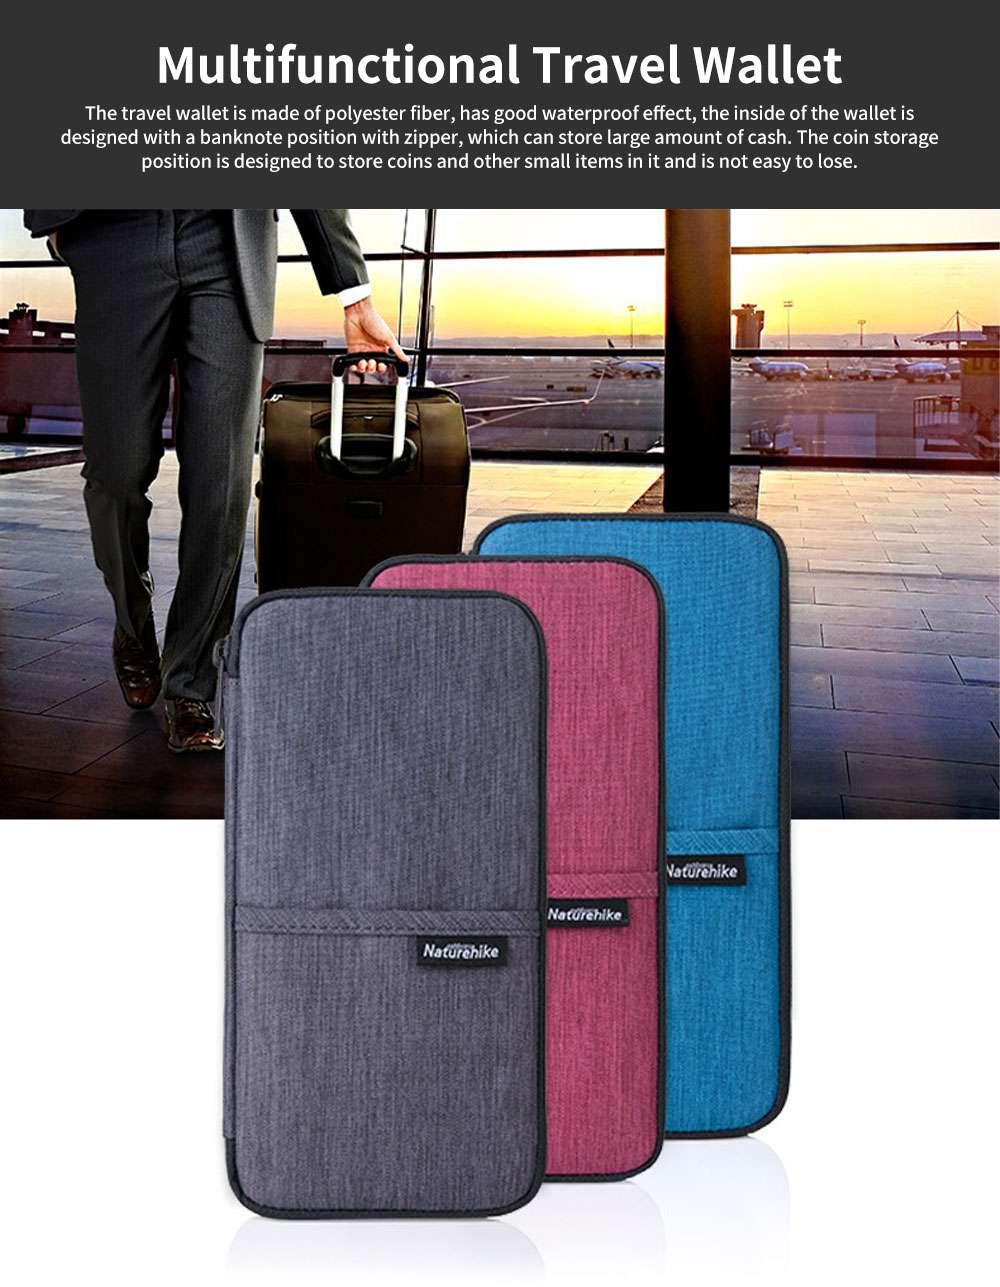 NH Travel Wallet Multifunctional Storage Bag Waterproof Documents Cash Change Passports Zipper Simple Card Holder 0